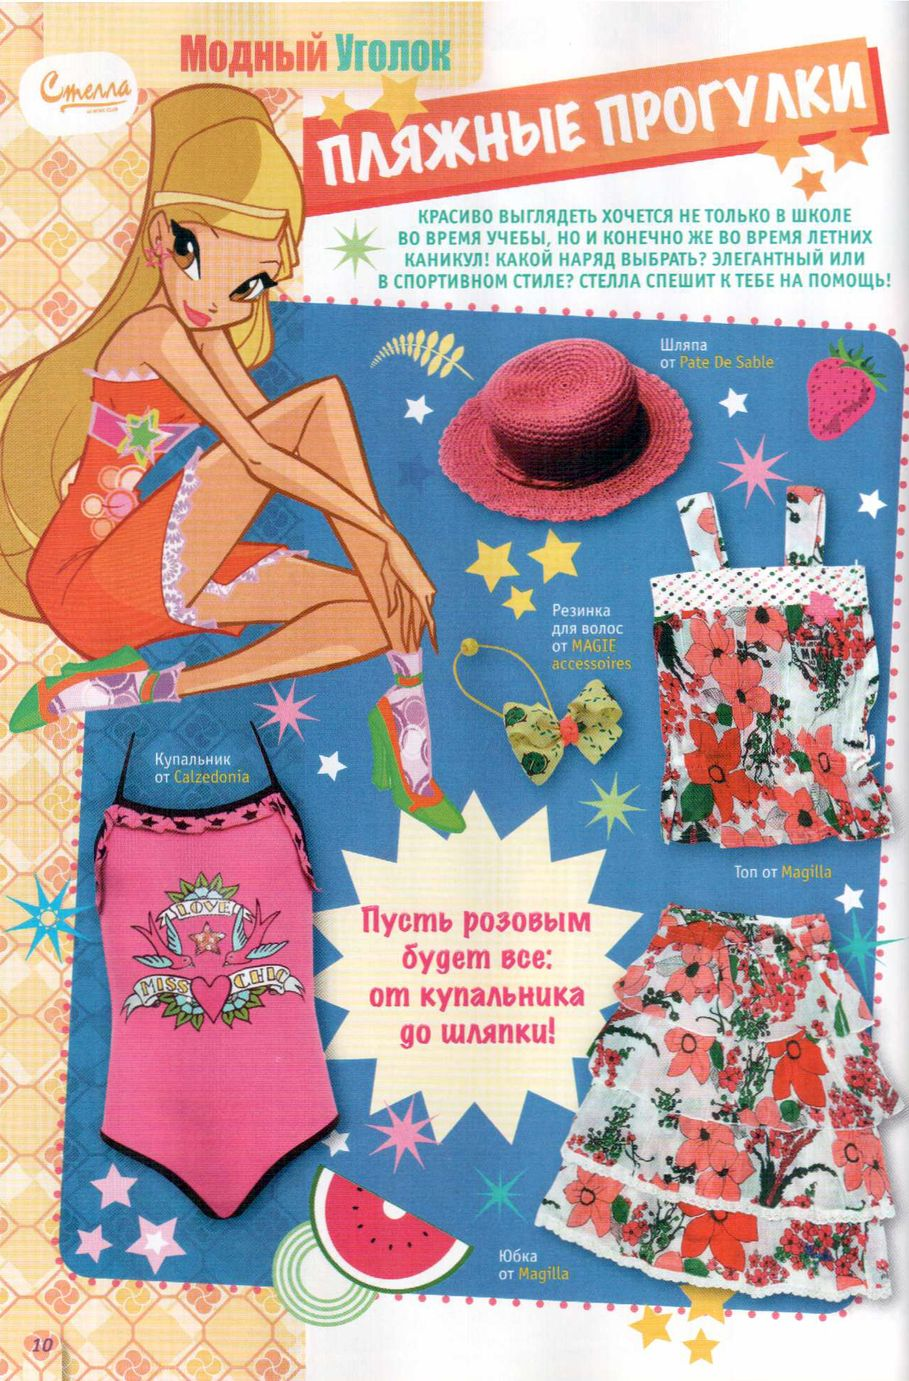 Комикс Винкс Winx - Любовь и ревность (Журнал Винкс №7 2011) - стр. 10